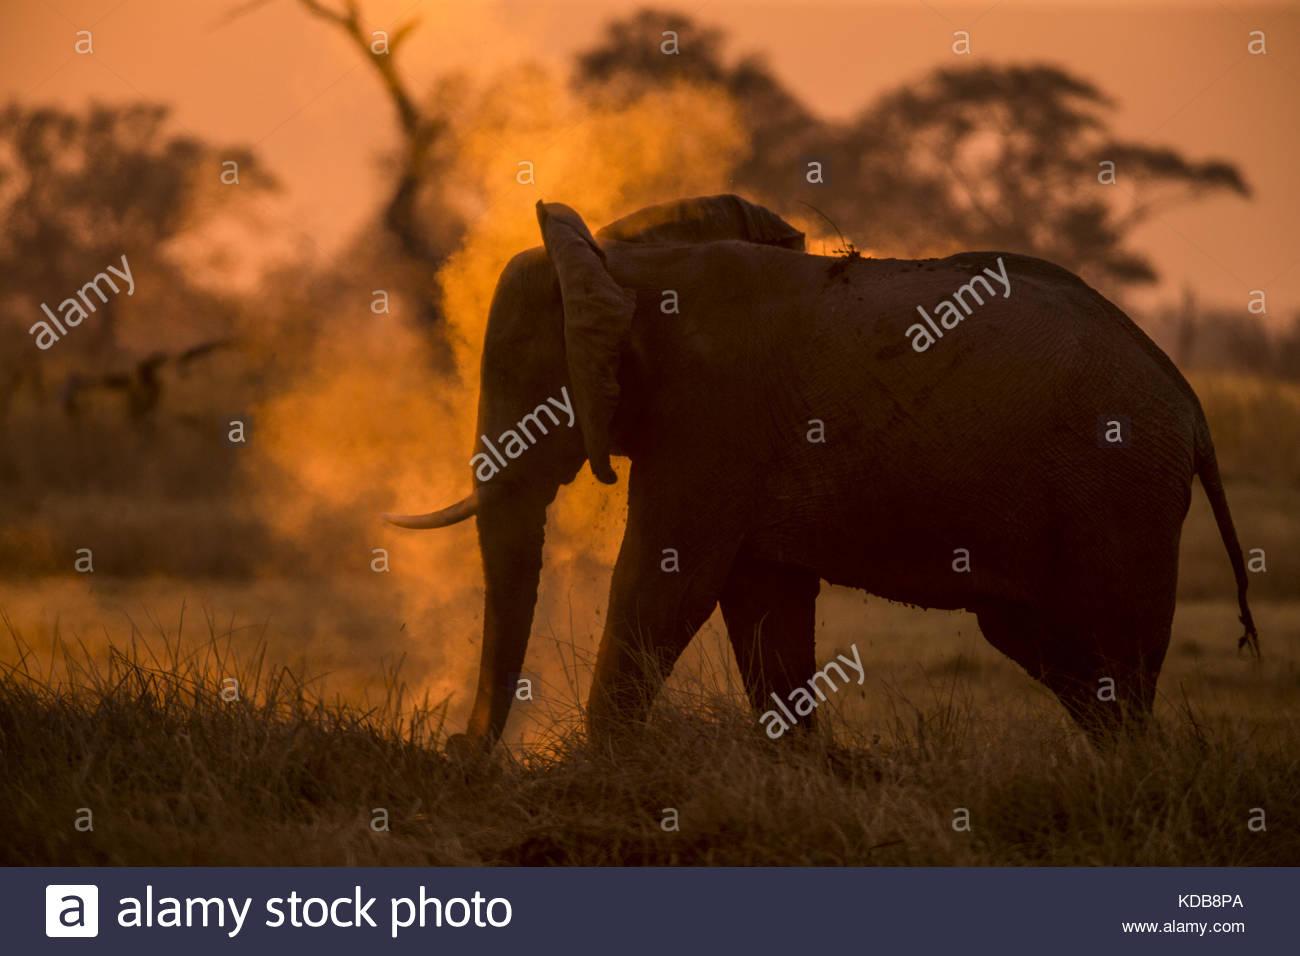 An Elephant, Loxodonta africana, dusting as the sun sets. - Stock Image